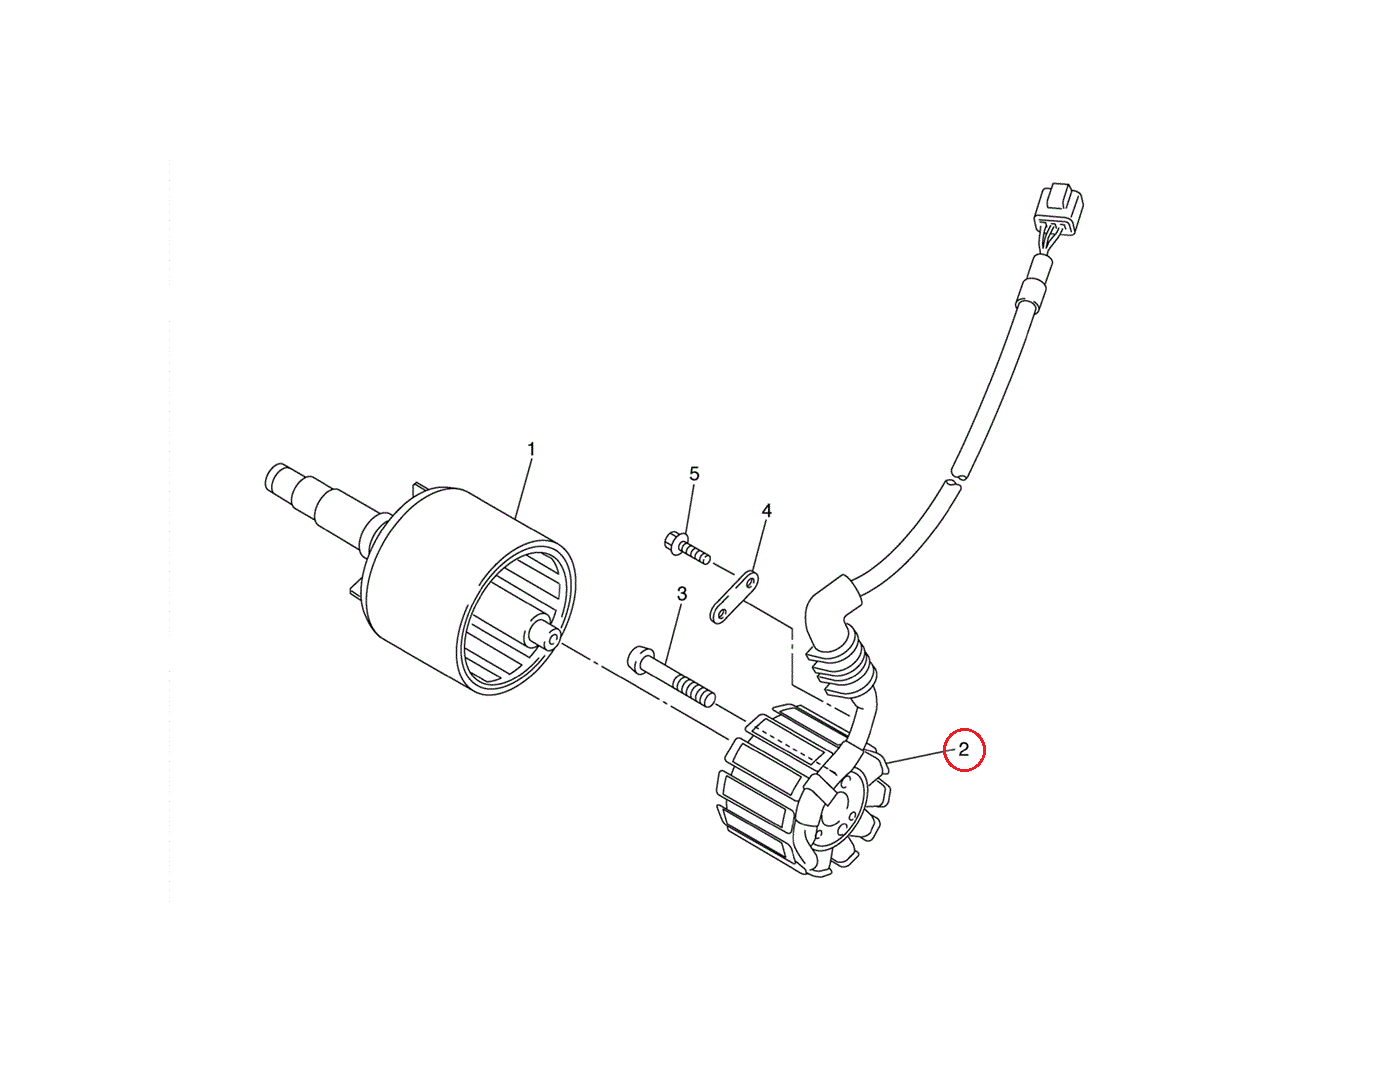 Yamaha Fz1 Wiring Diagram